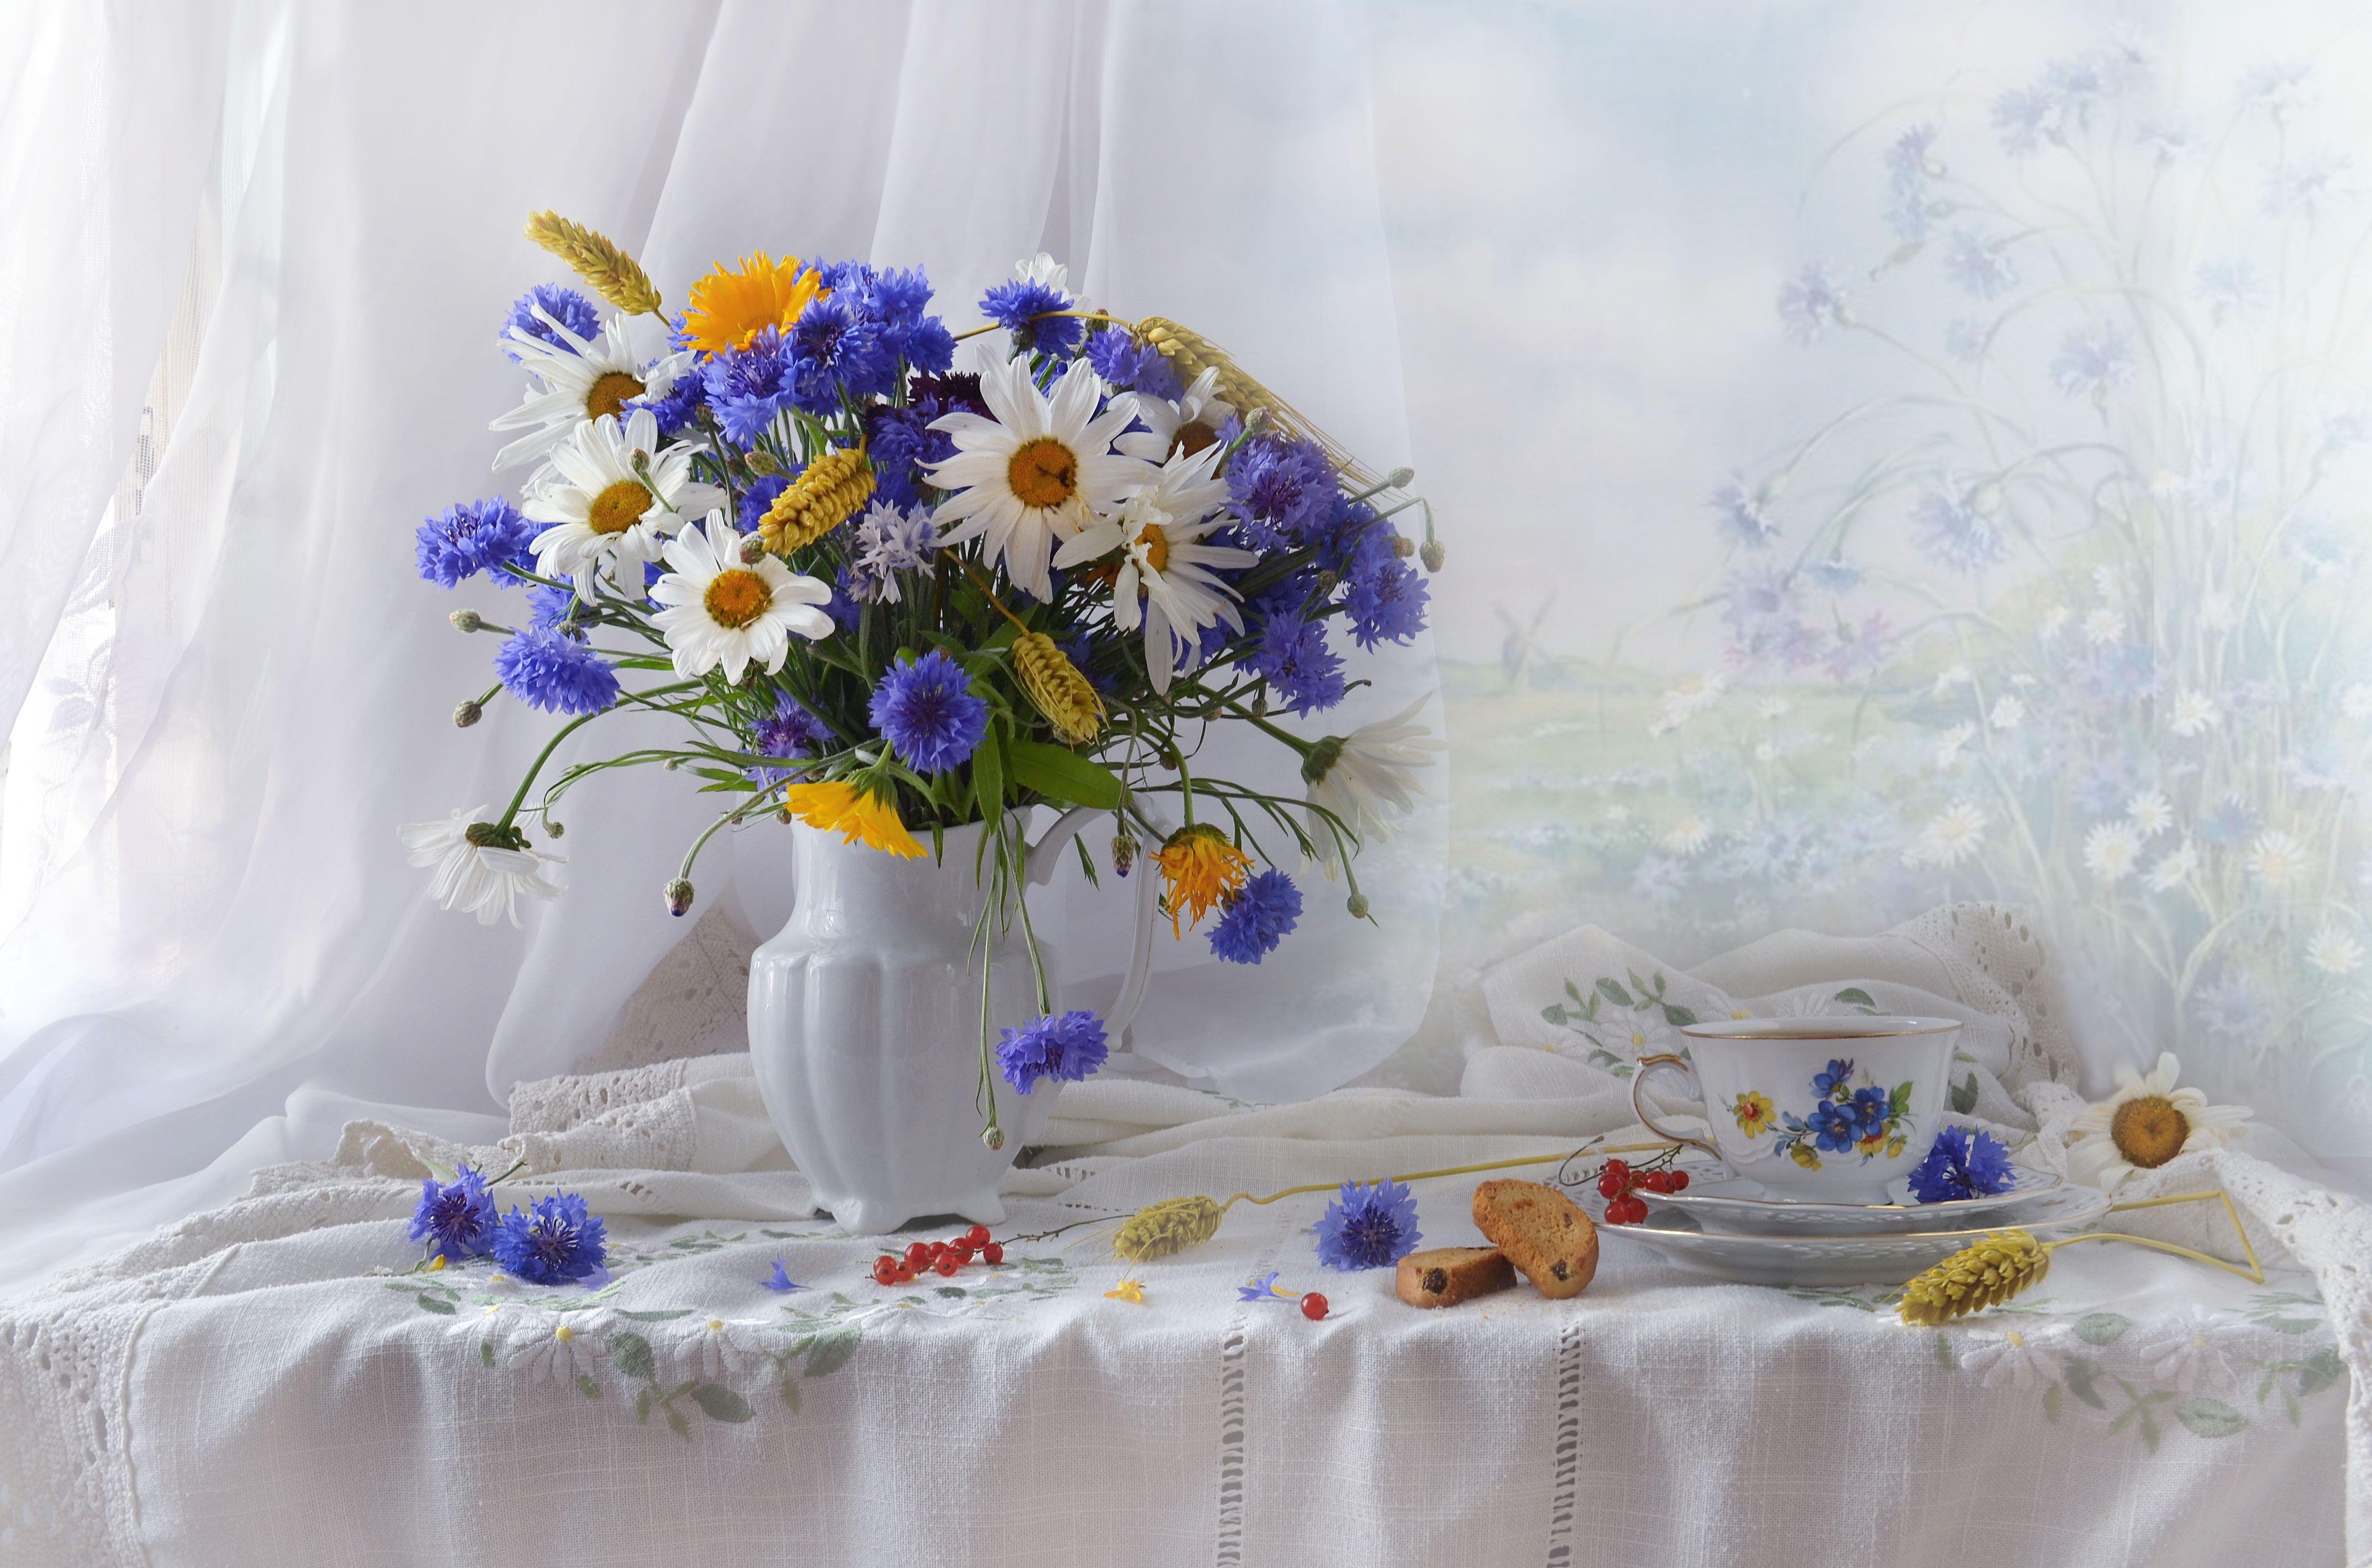 still life,натюрморт, лето, июль, цветы, фото натюрморт, фарфор, ромашки, колоски, васильки, Колова Валентина